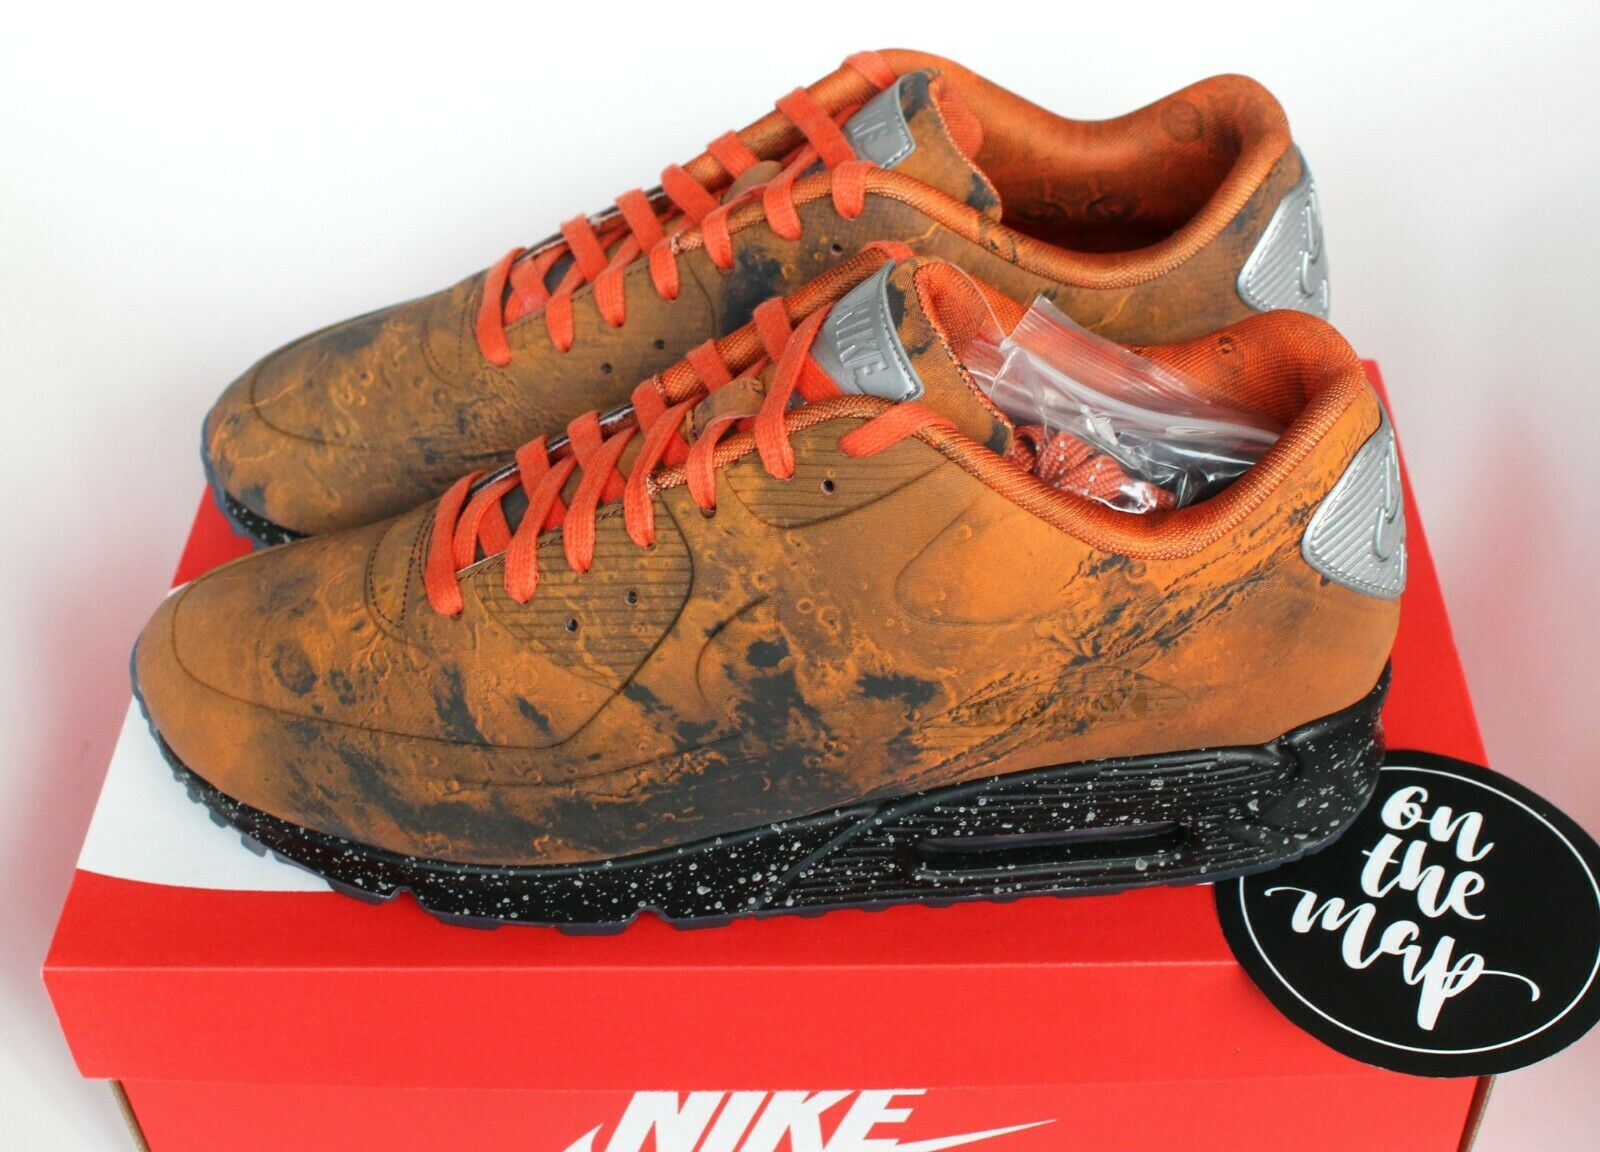 Nike Air Max 90 QS AM90 Mars Landing Magma orange UK 5 6 7 8 9 10 11 12 US New